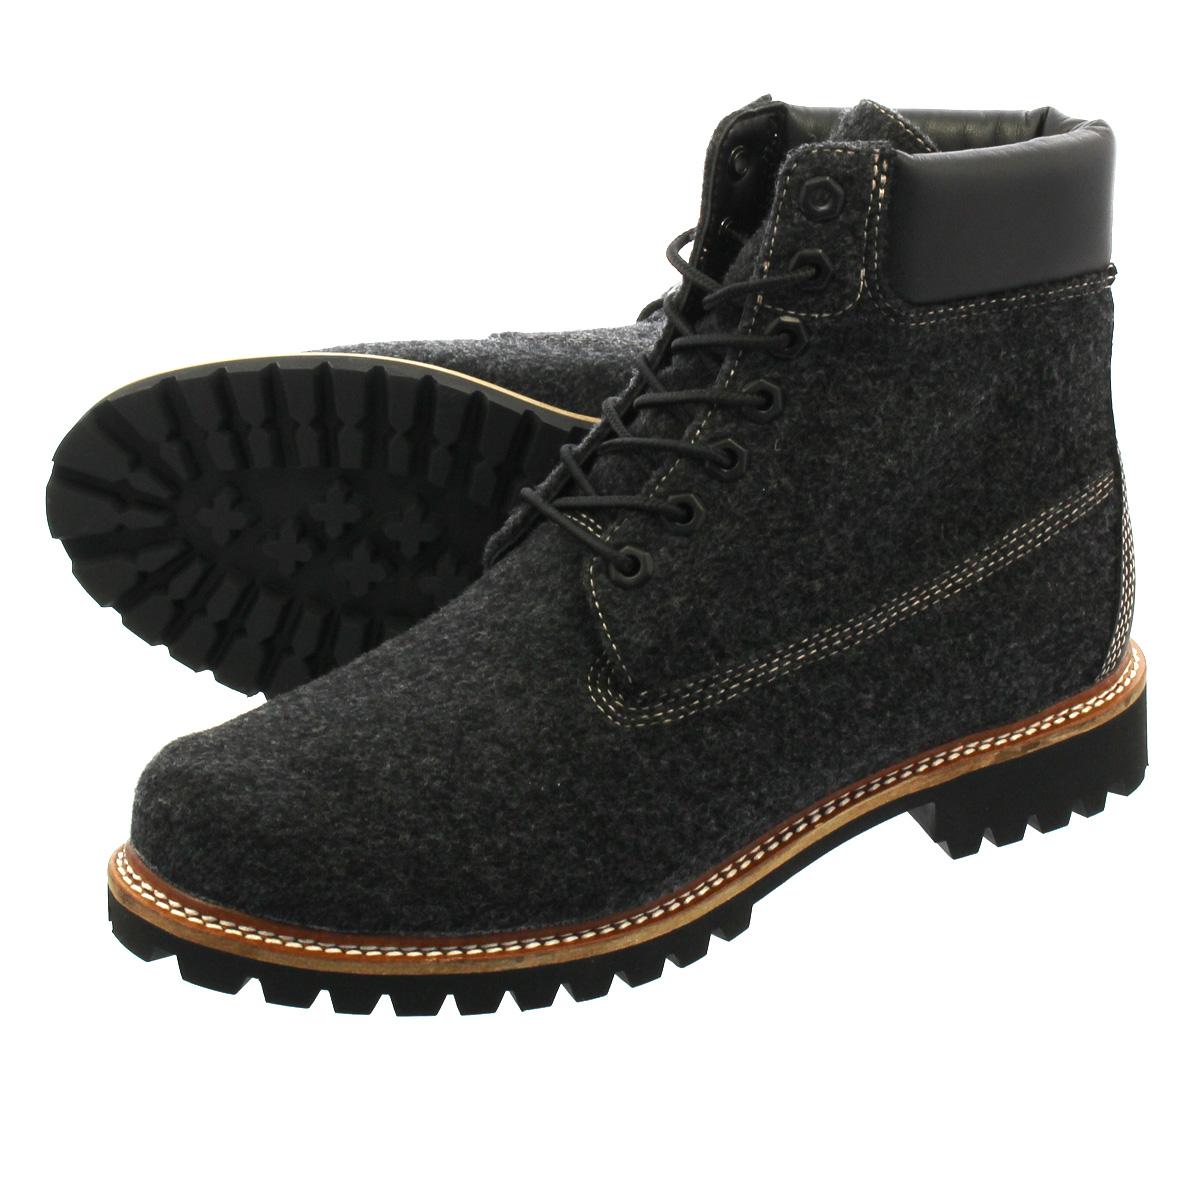 TIMBERLAND 6inch LTD WOOL BOOTS ティンバーランド 6インチ リミテッド ウール ブーツ CHARCOAL/DARK GREY a1u6z